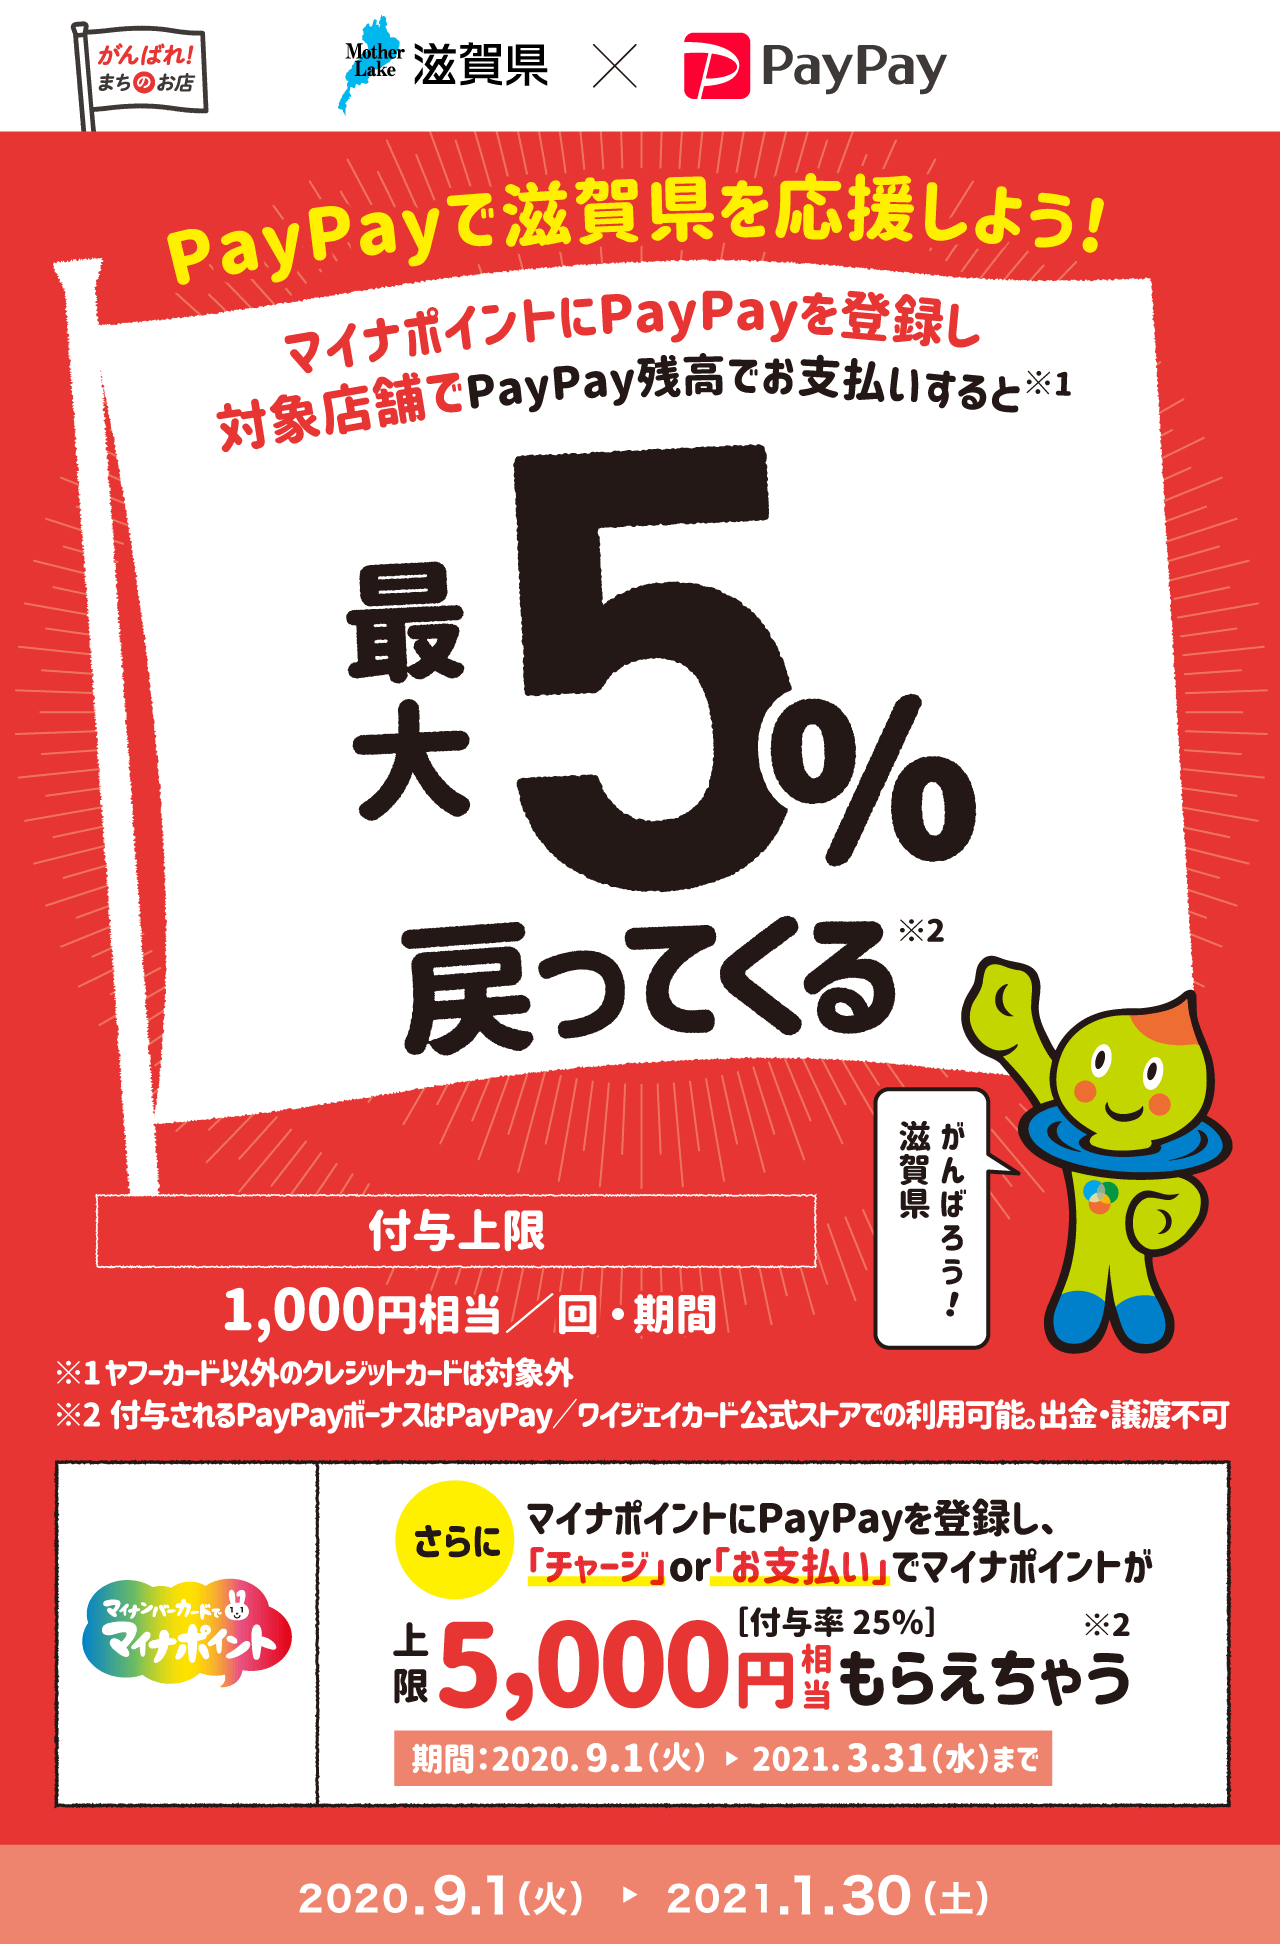 PayPayで滋賀県を応援しよう!マイナポイントにPayPayを登録し 対象店舗でPayPay残高でお支払いすると 最大5%戻ってくる